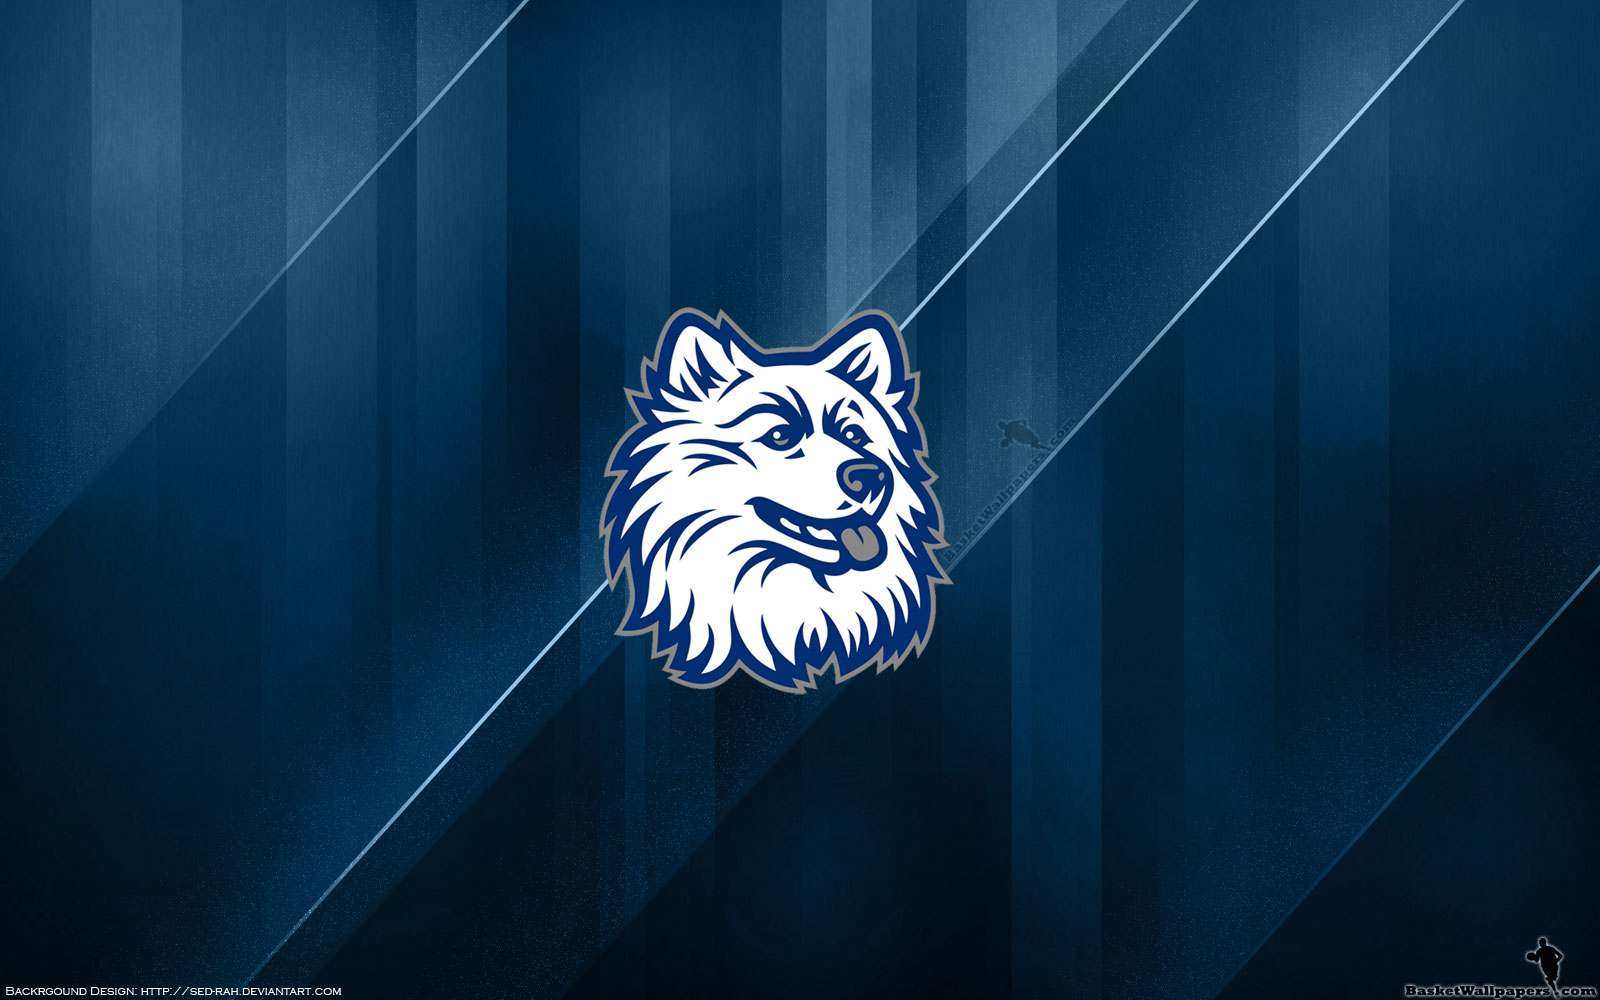 uconn huskies widescreen 06 03 2011 isaiah thomas washington huskies 1600x1000